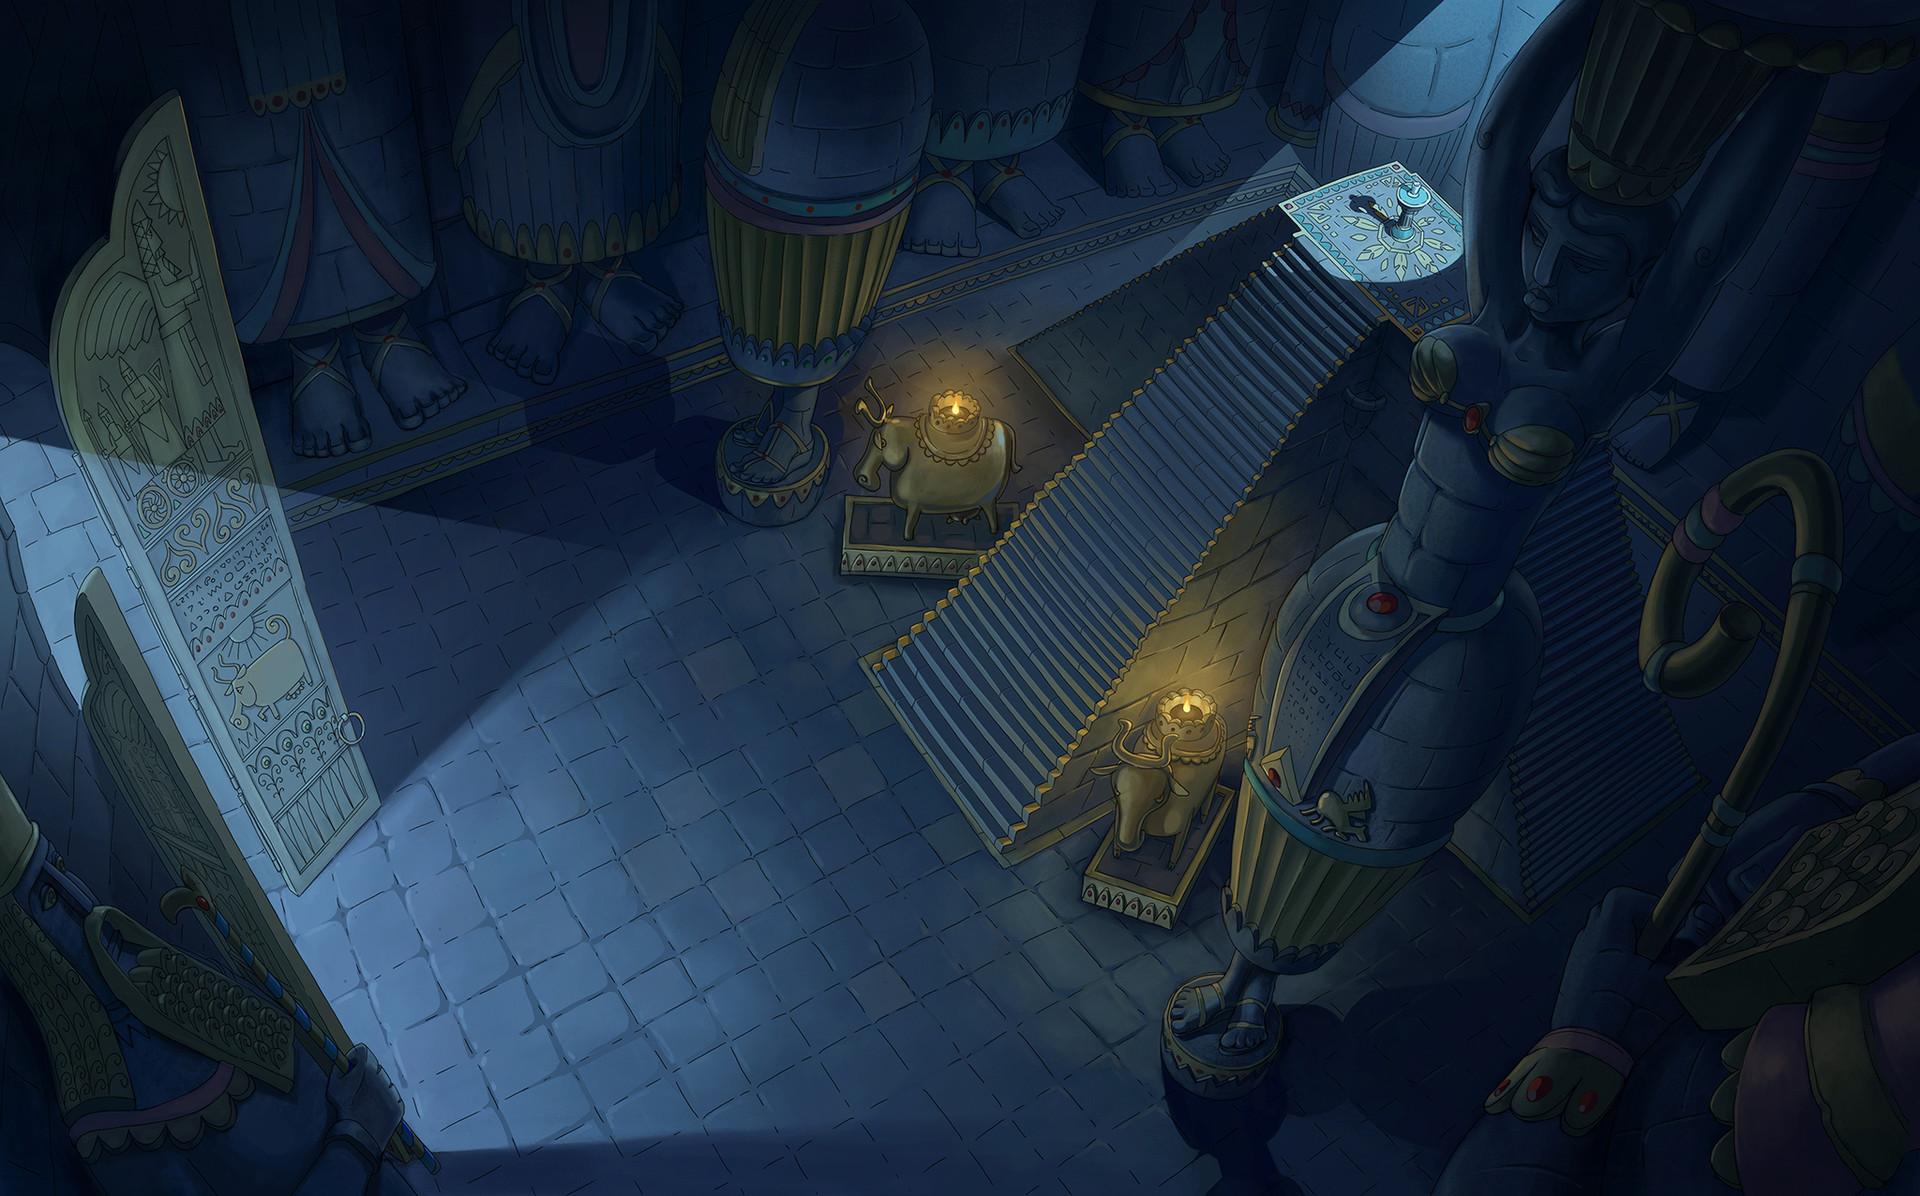 egor-afonin-master-hram-01.jpg